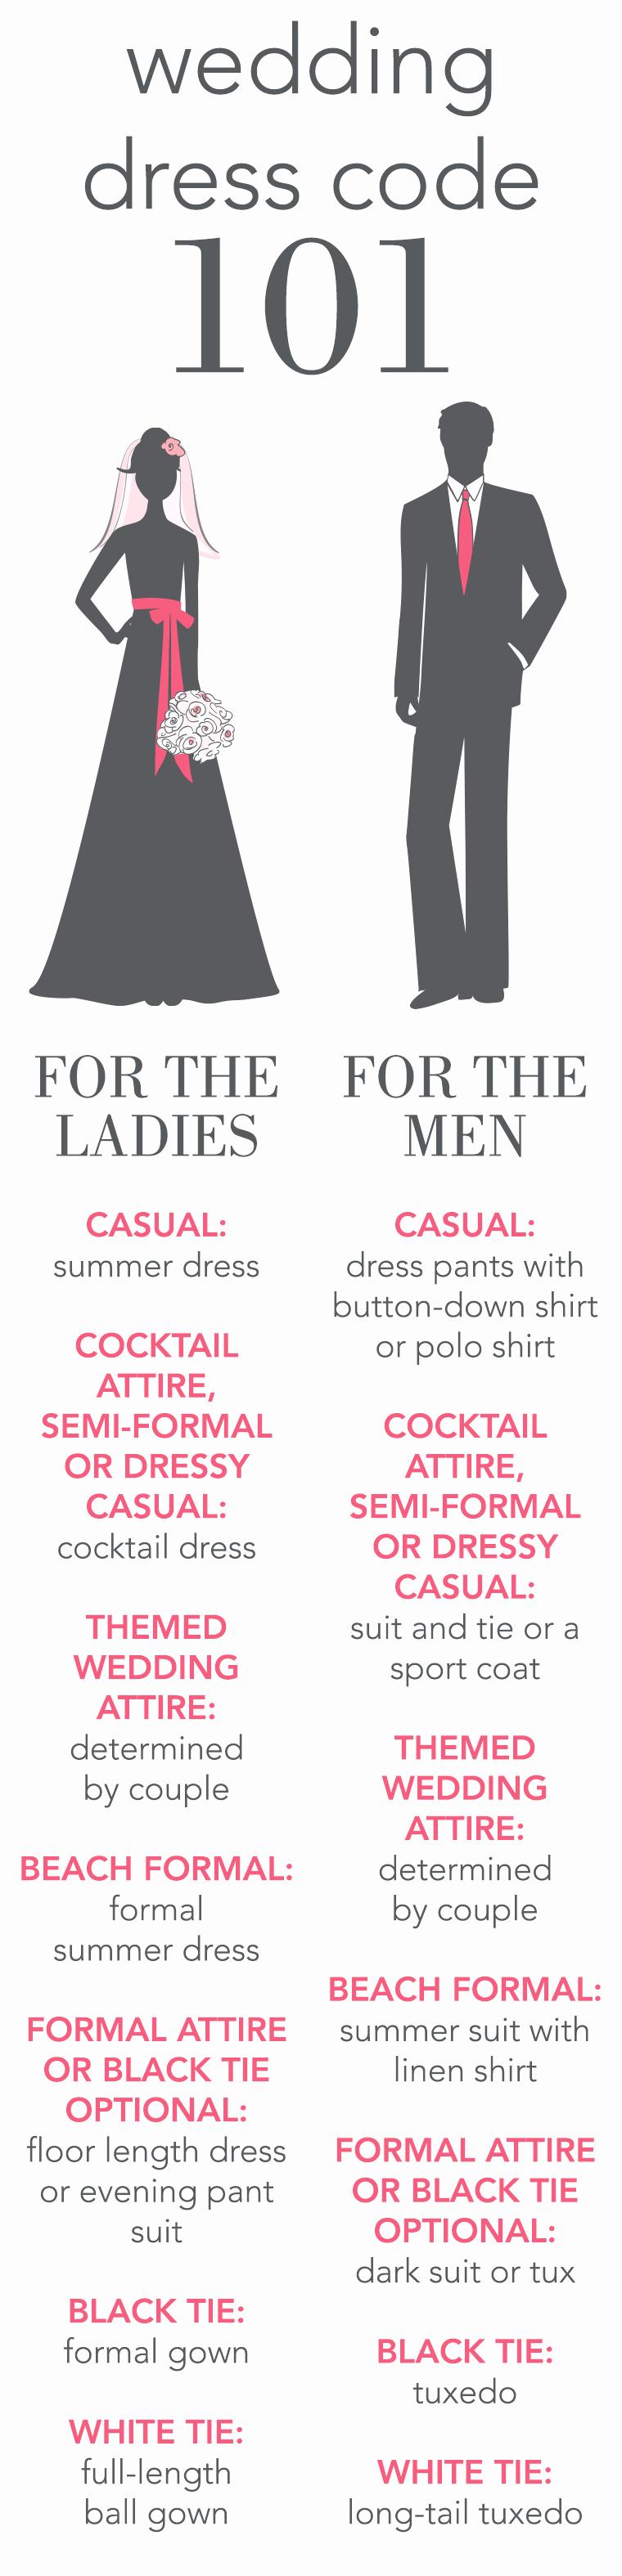 Invitation Dress Code Wording Inspirational Wedding Dress Code 101